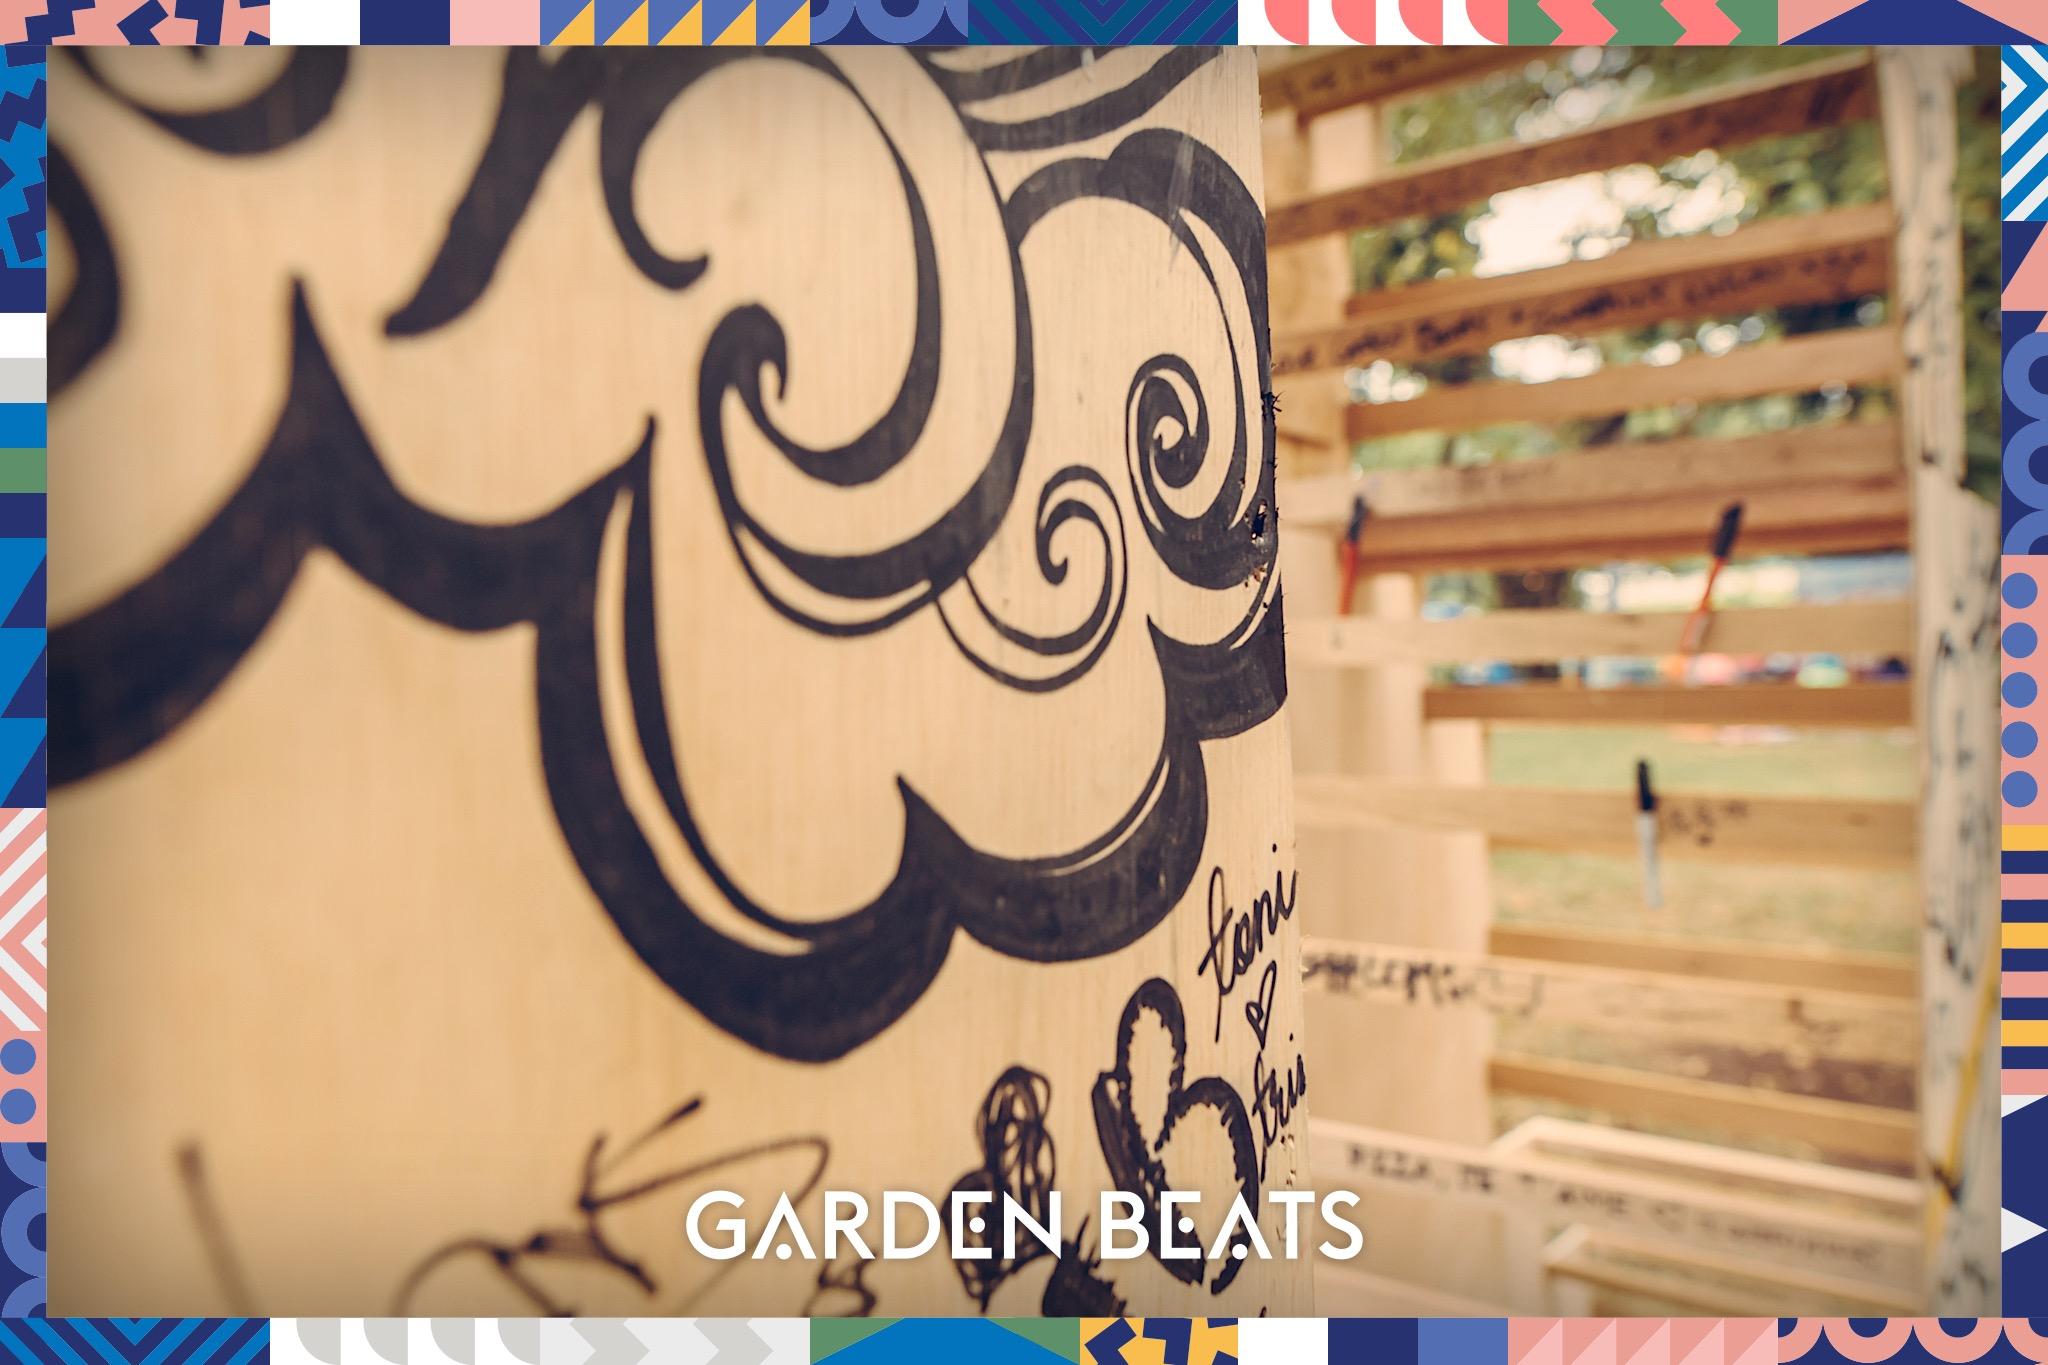 03032018_GardenBeats_Colossal078_Watermarked.jpg